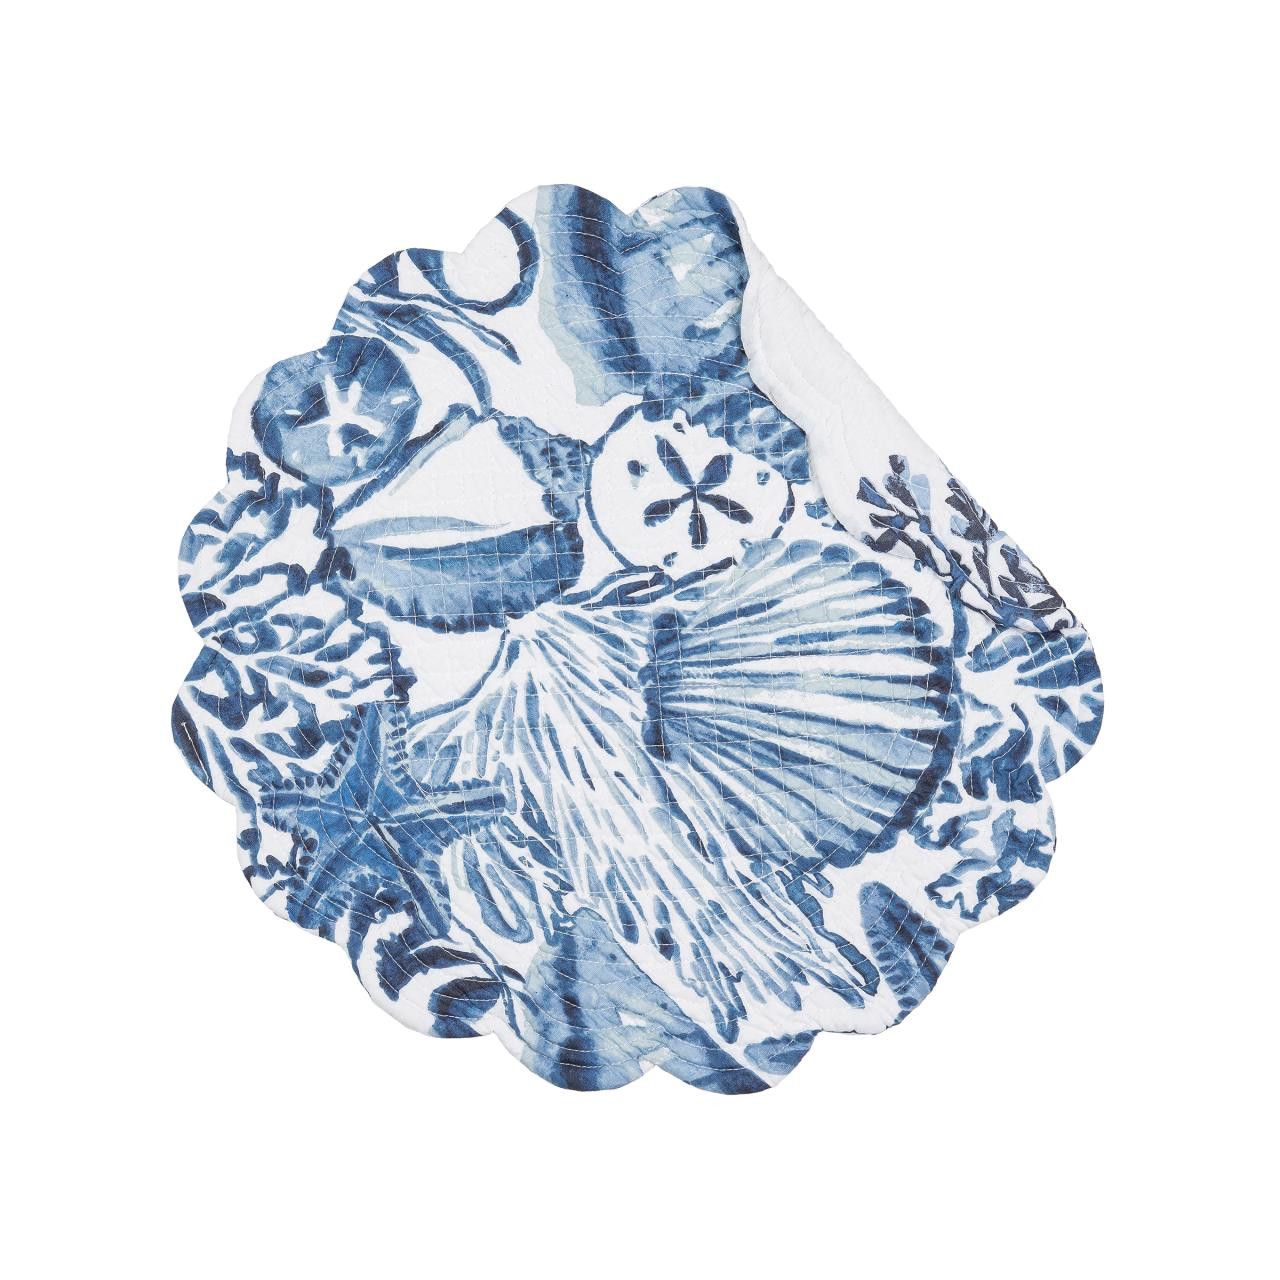 Blue Coast Shells Round Placemat Set - 8246776420